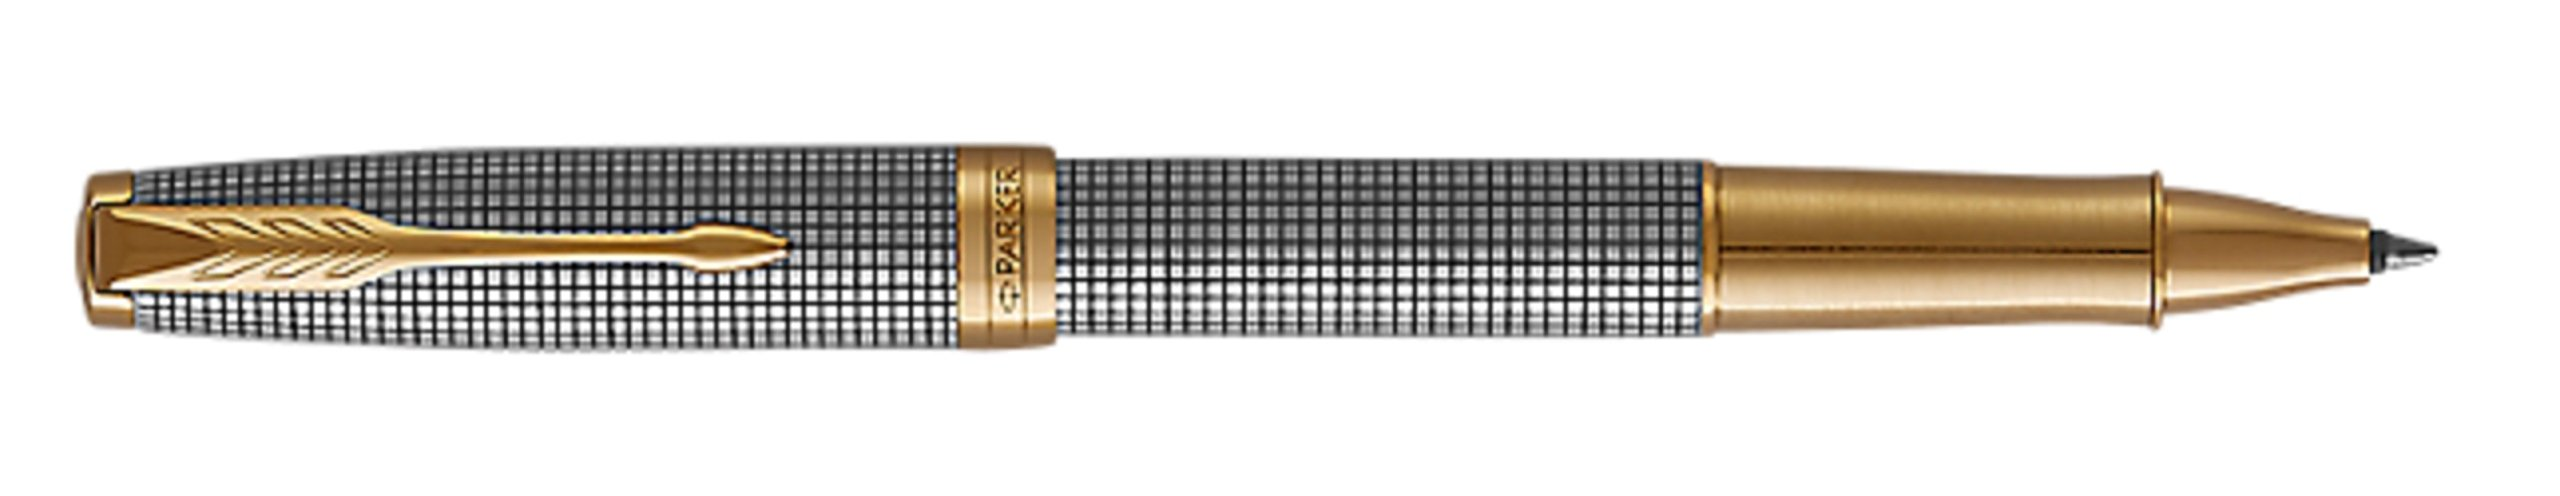 PARKER Sonnet Rollerball Pen, Prestige Chiselled Silver with Gold Trim, Fine Point Black Ink by Parker (Image #7)